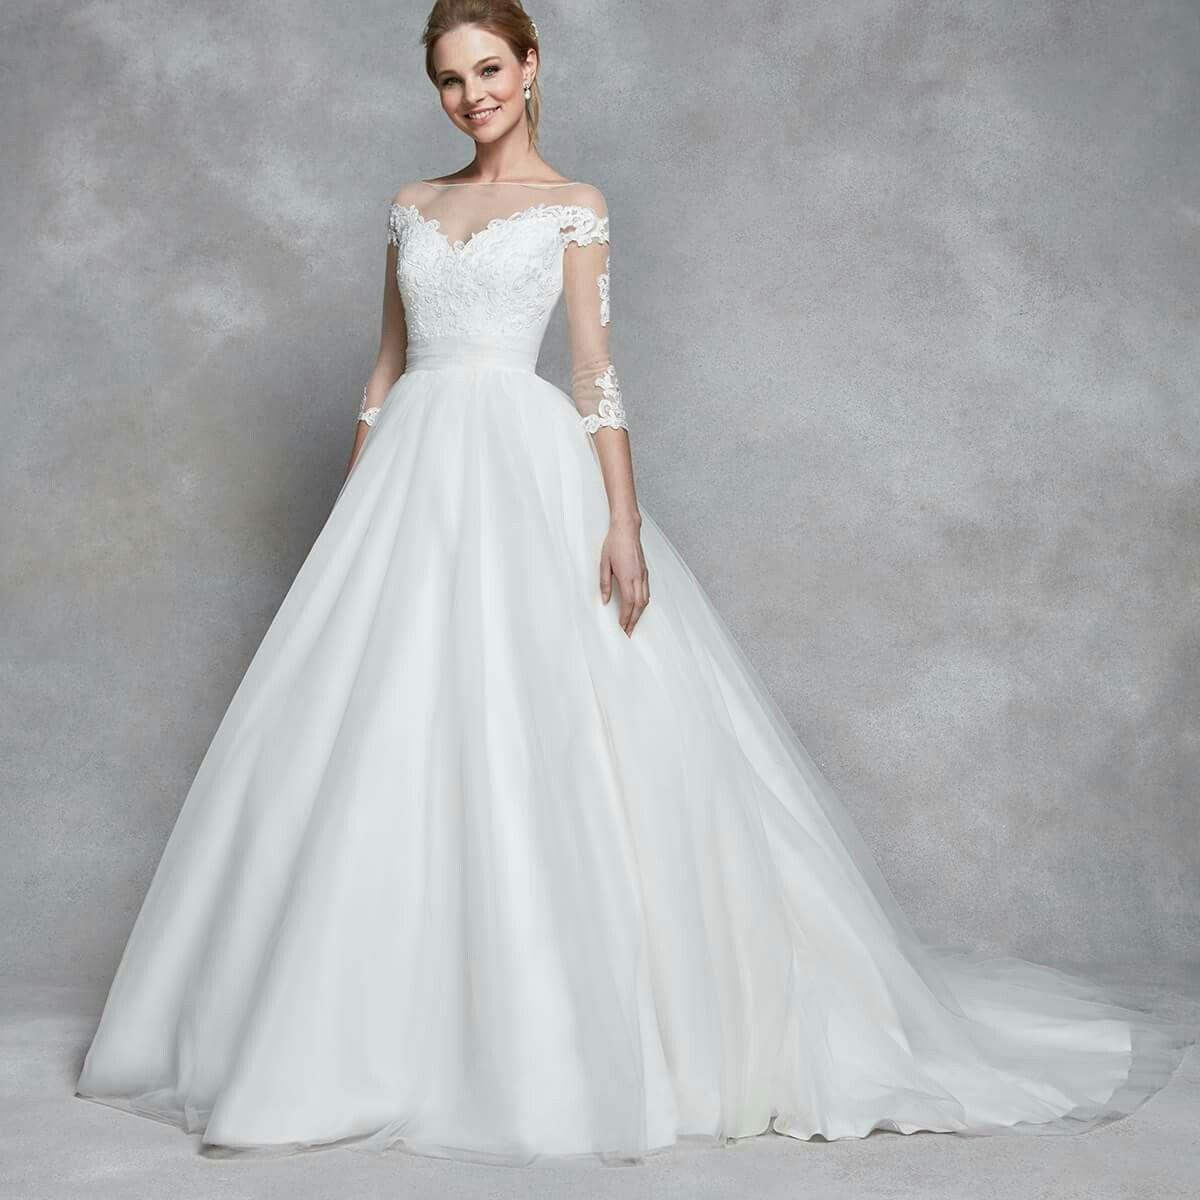 Wedding dress designers under 5000  Pin by Laura Beatty on Wedding Dress  Pinterest  Wedding dress and